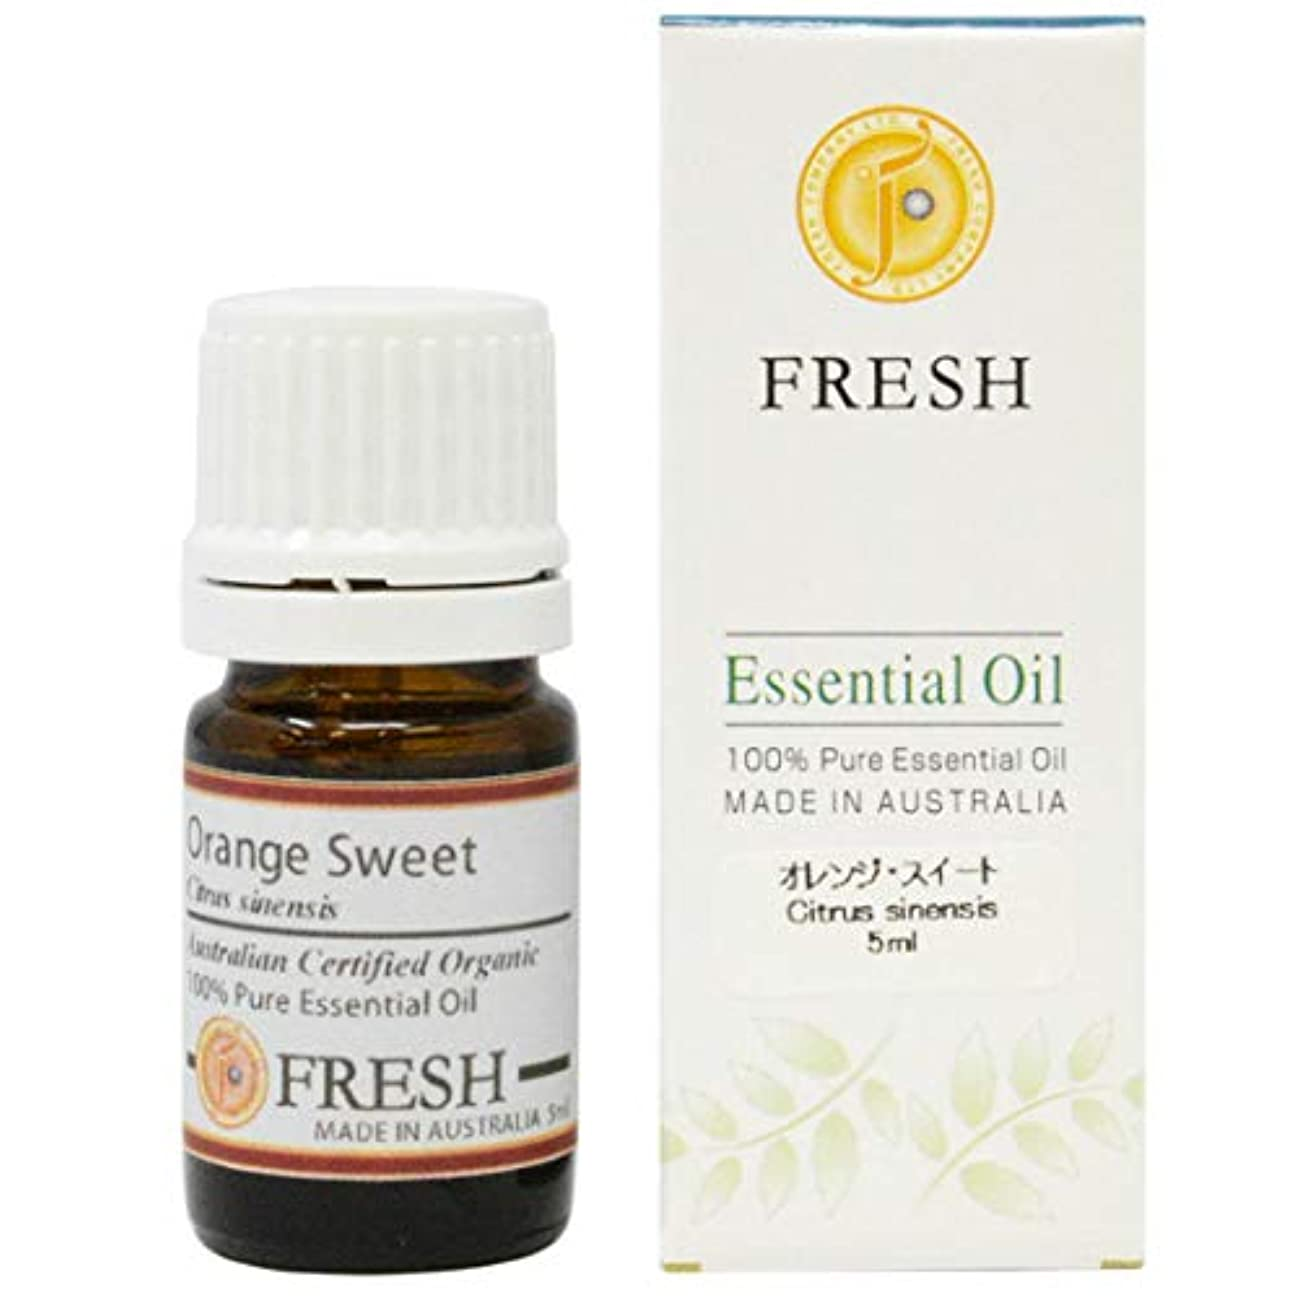 FRESH オーガニック エッセンシャルオイル オレンジ?スイート 5ml (FRESH 精油)